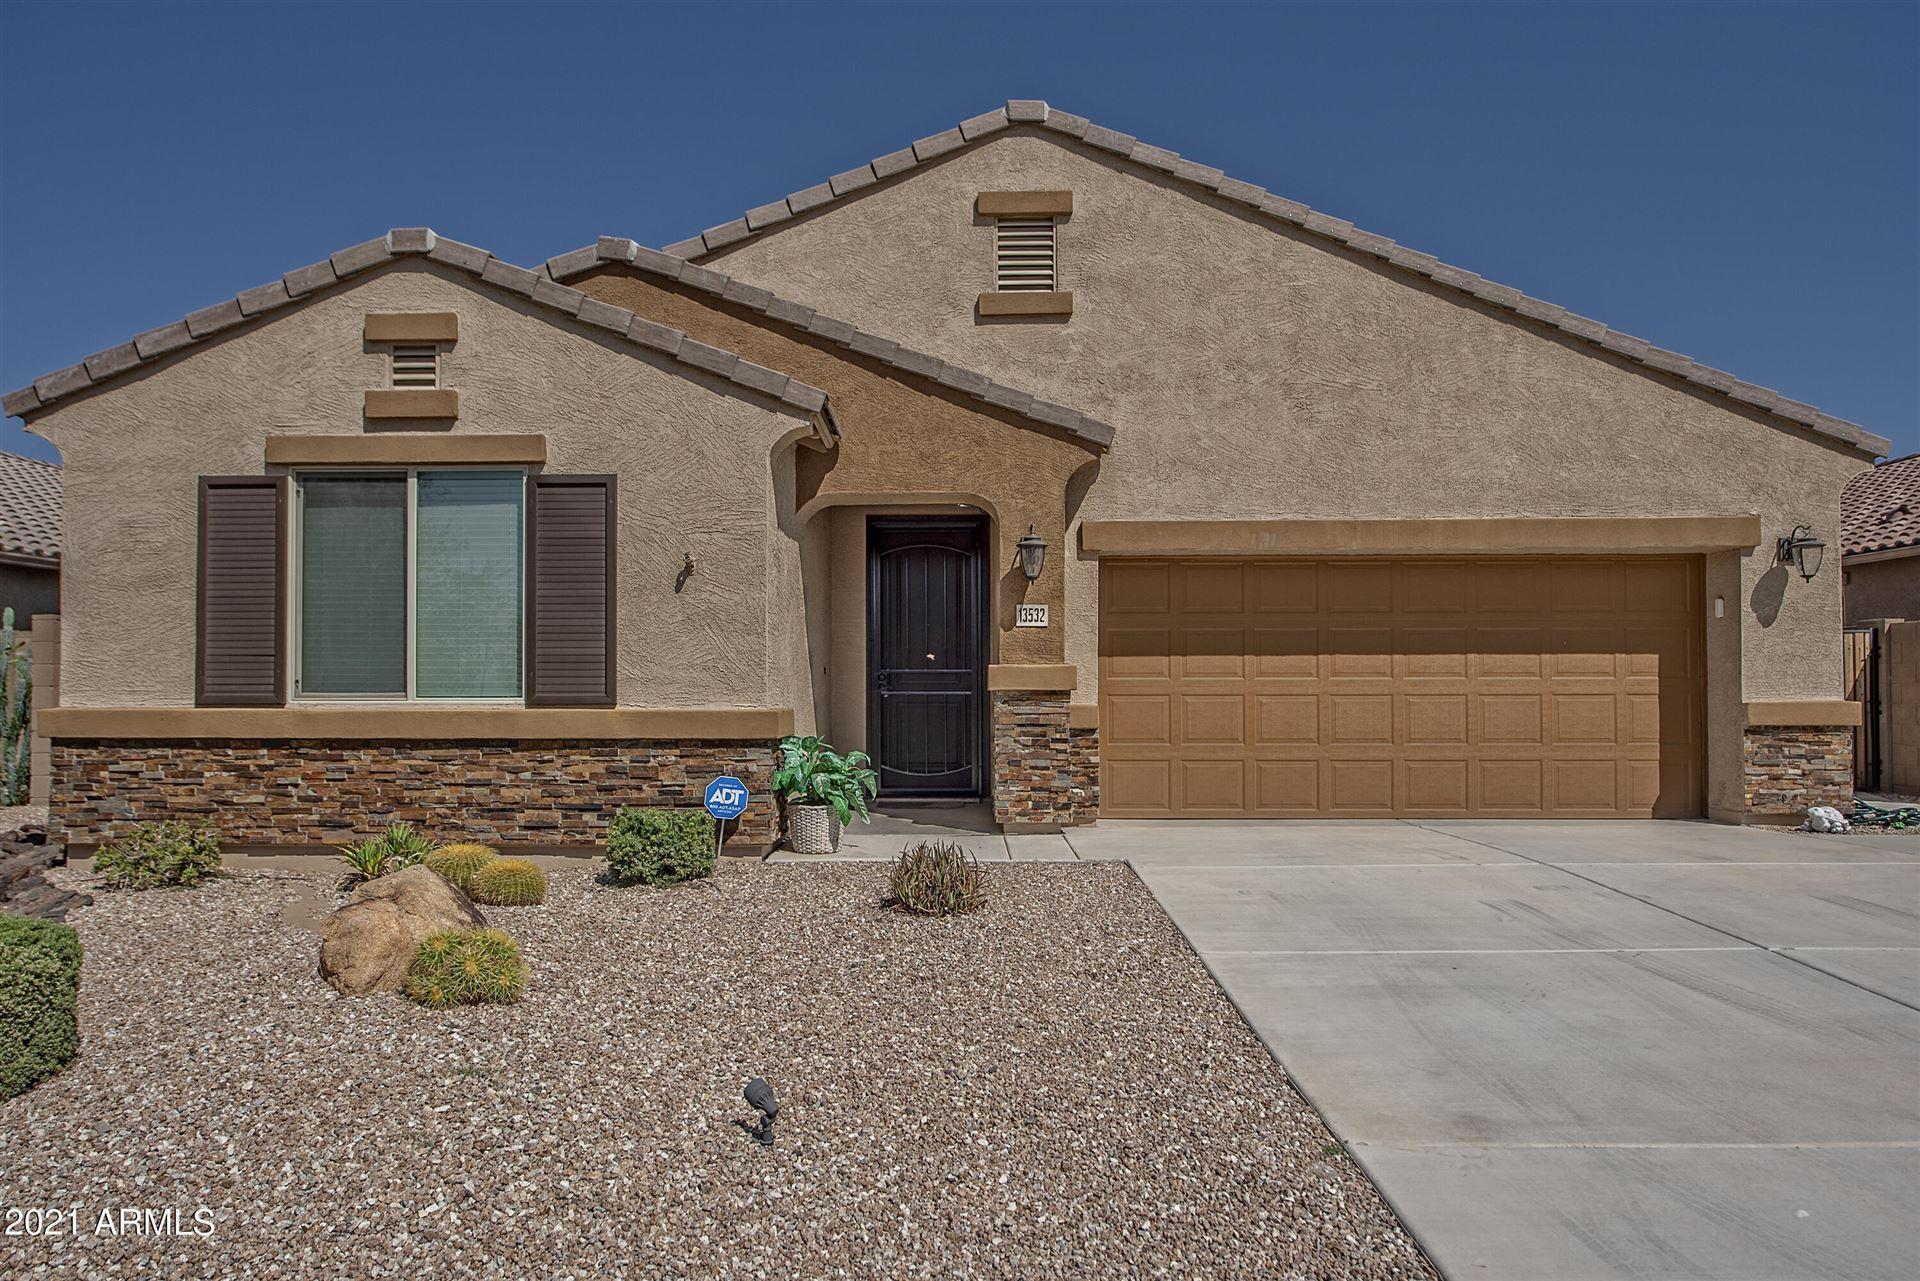 Photo of 13532 W DESERT MOON Way, Peoria, AZ 85383 (MLS # 6296686)